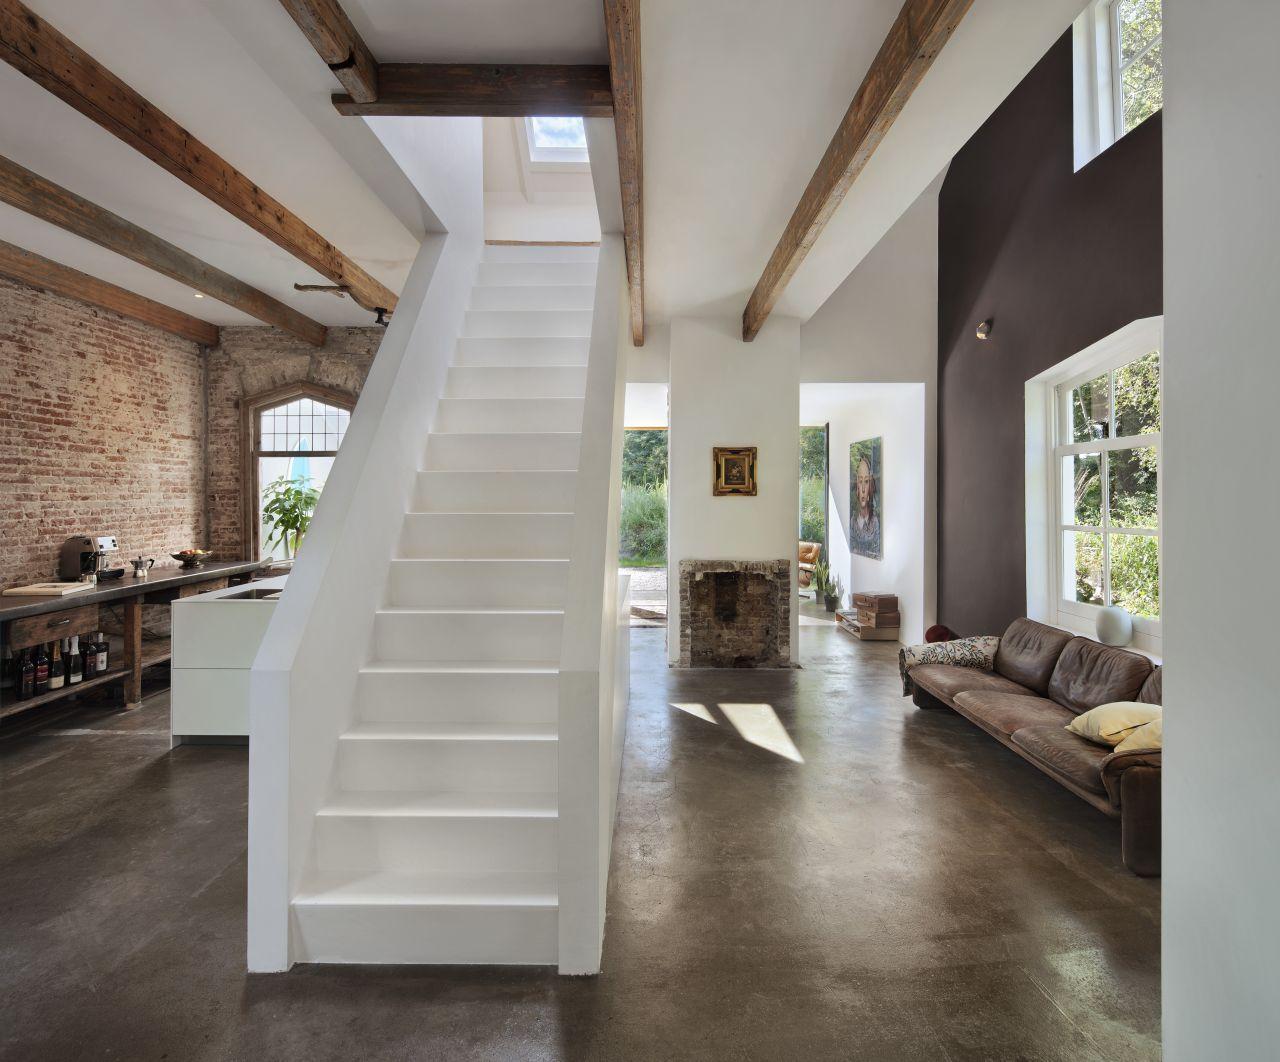 http://2.bp.blogspot.com/-OJmNZgYBxHc/UPWRQG6-cLI/AAAAAAAAT2s/4tR7YQKFNCs/s1600/10-rail-house-santpoort-by-zecc-architecten.jpg